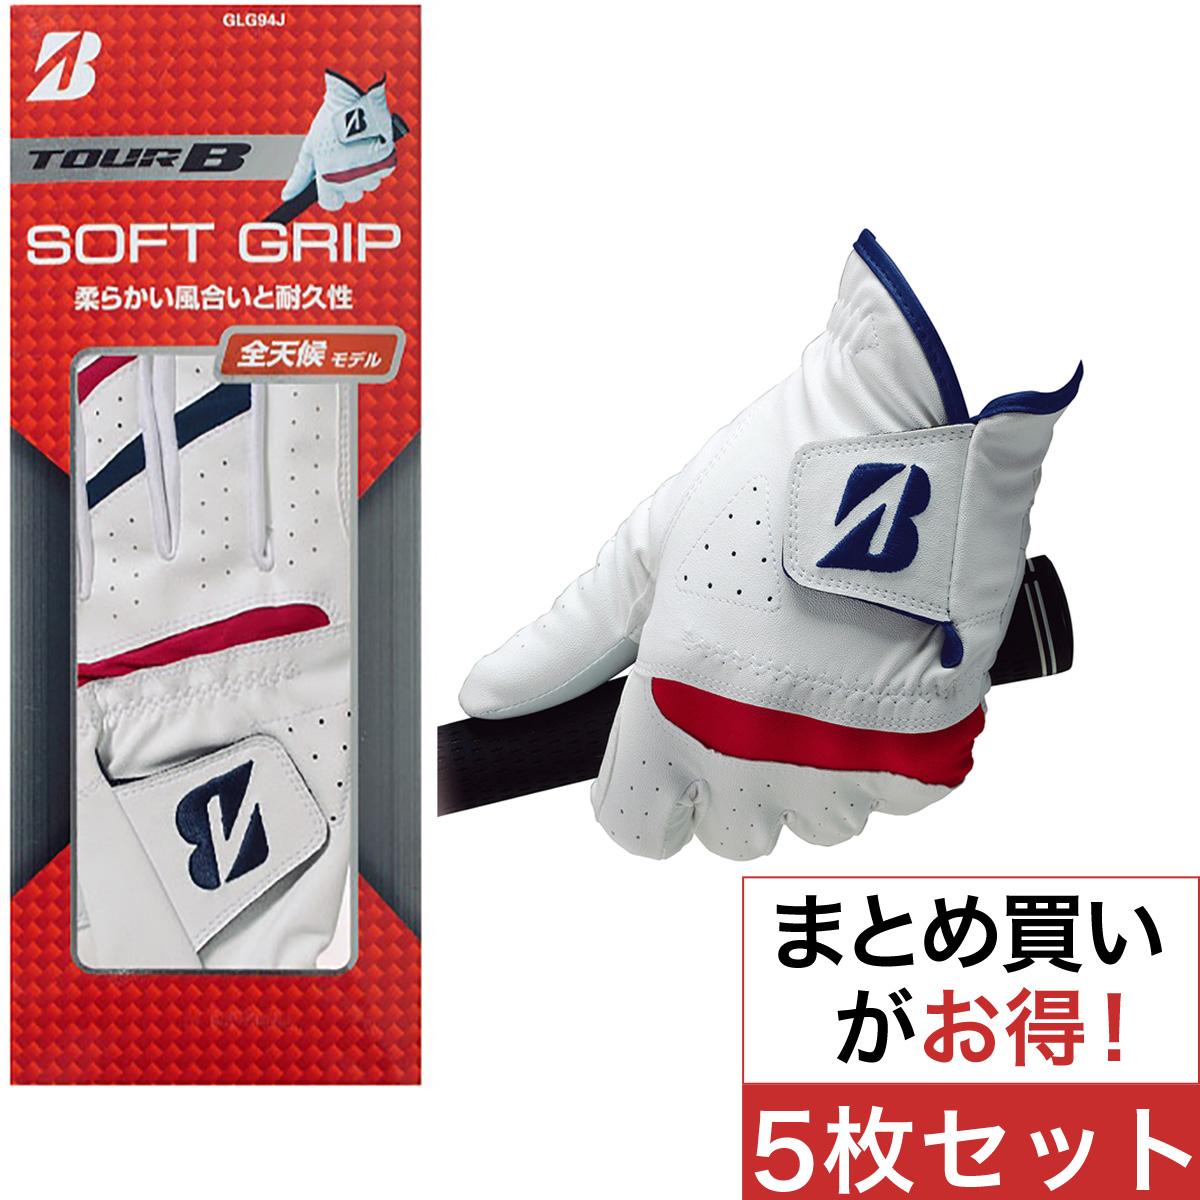 SOFT GRIP グローブ 5枚セット